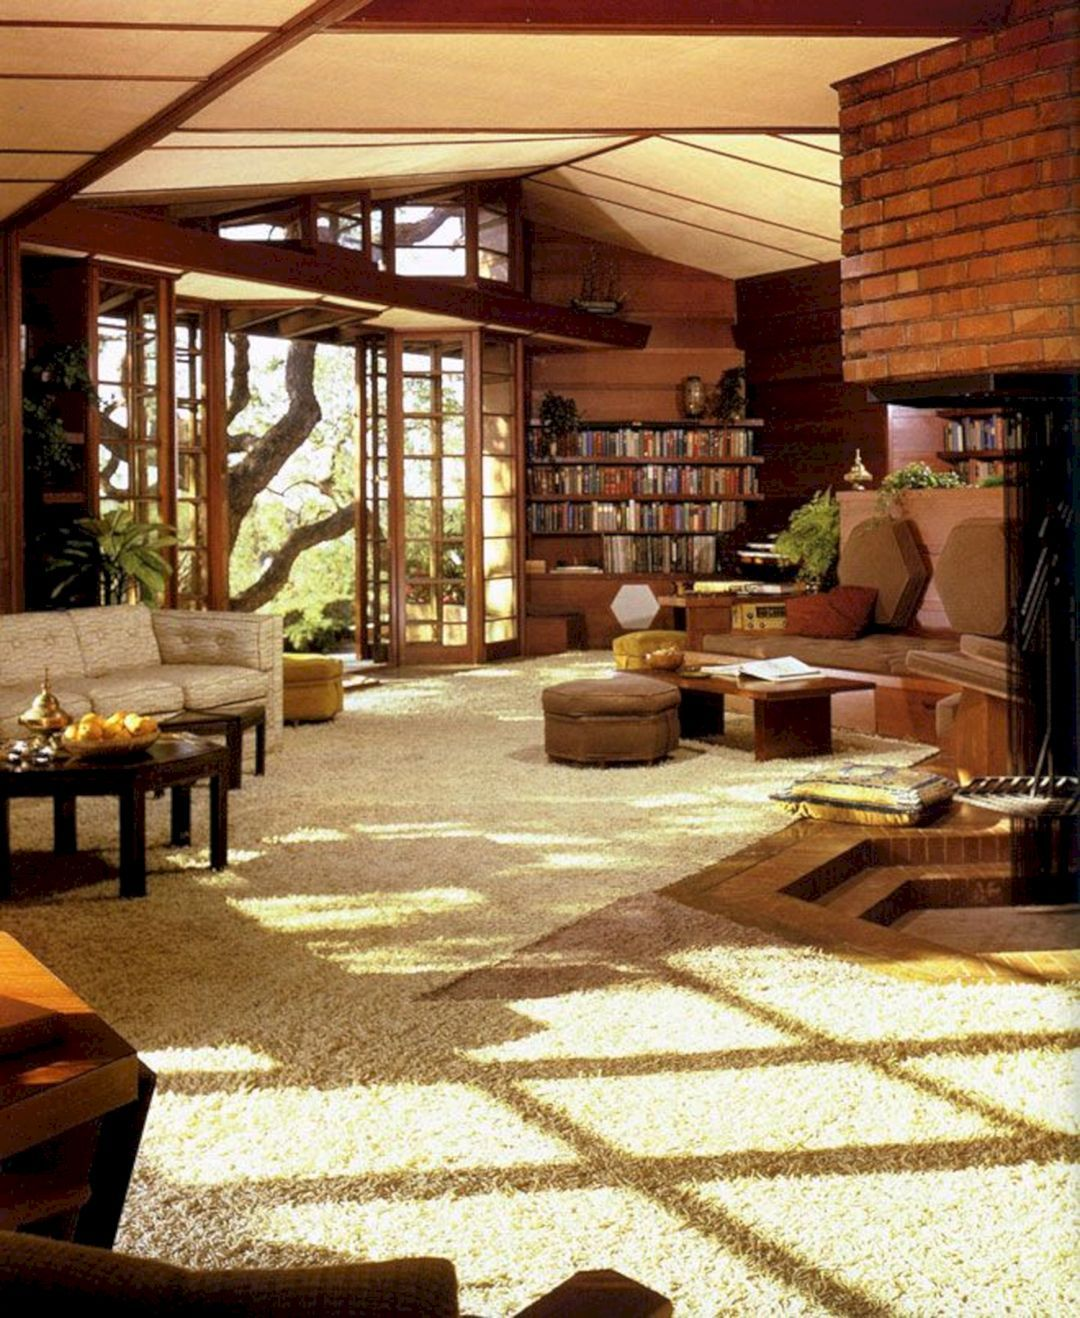 Modern Barndominium Floor Plans 2 Story with Loft 30 40 4